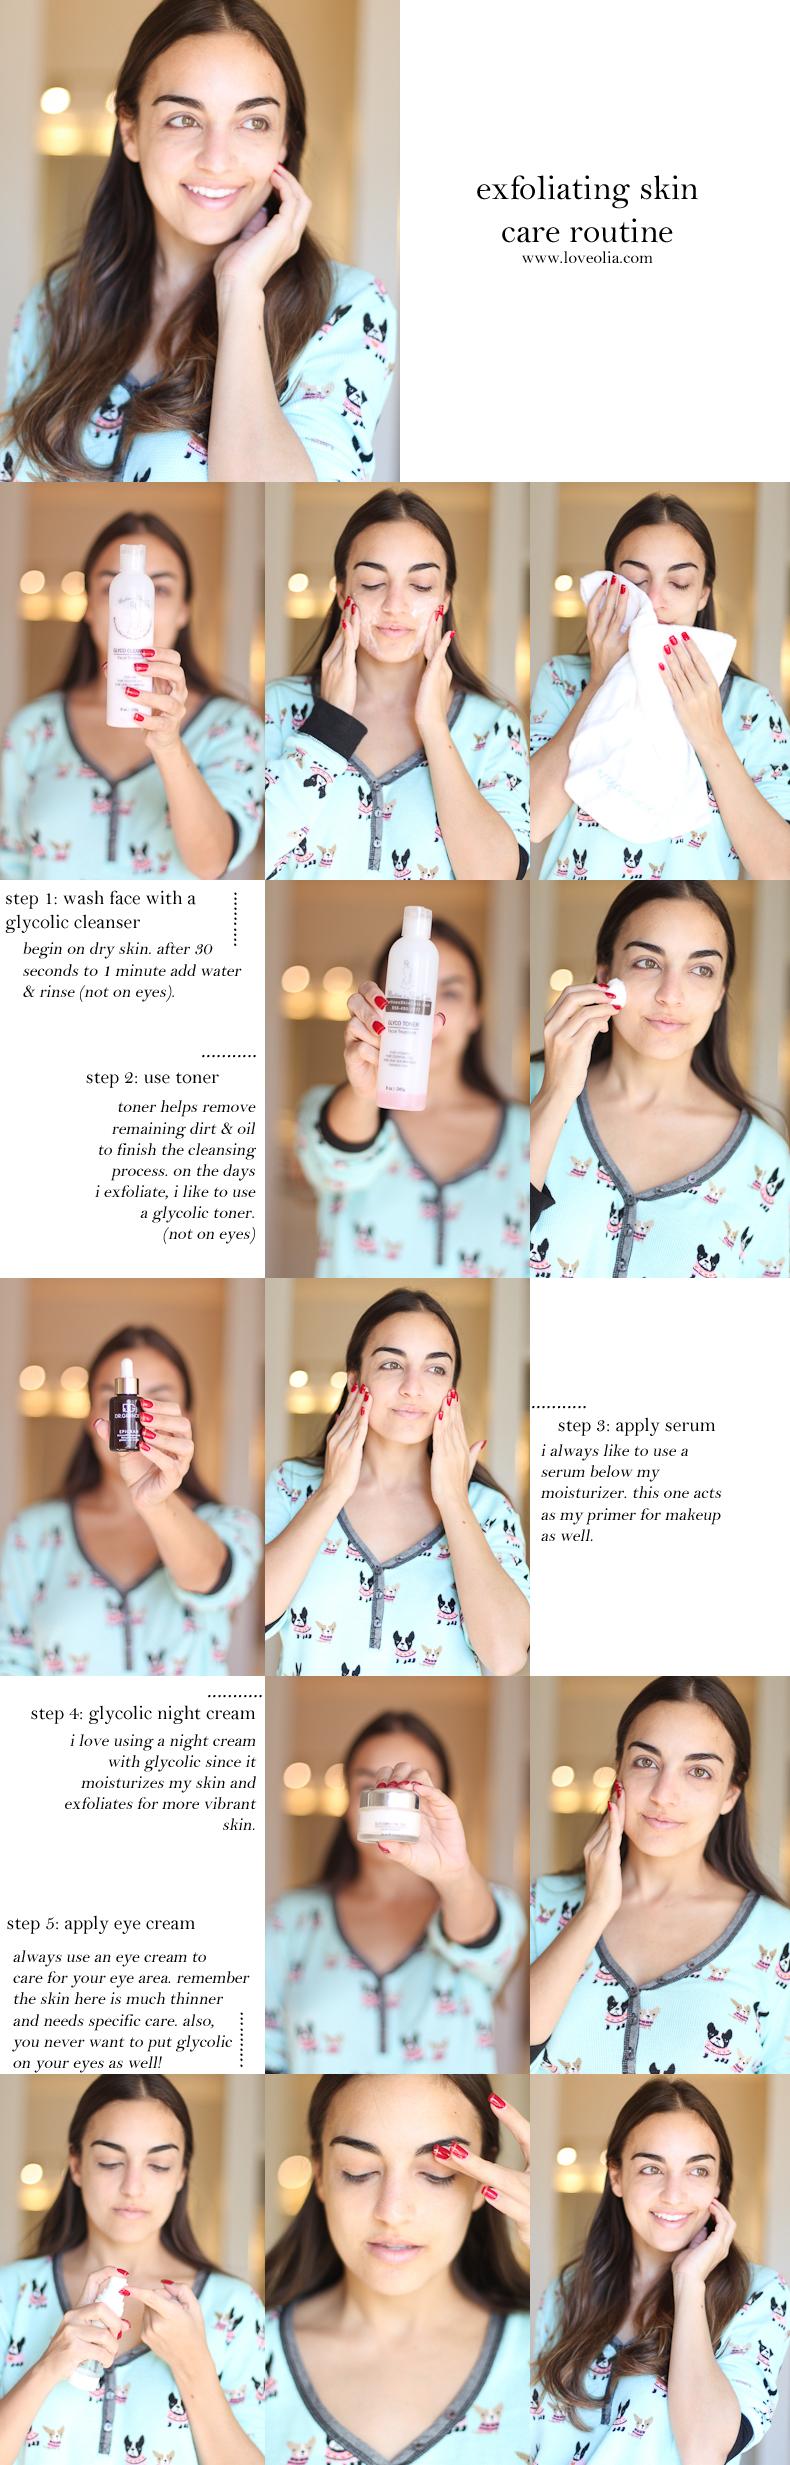 exfoliating-skin-care-routine